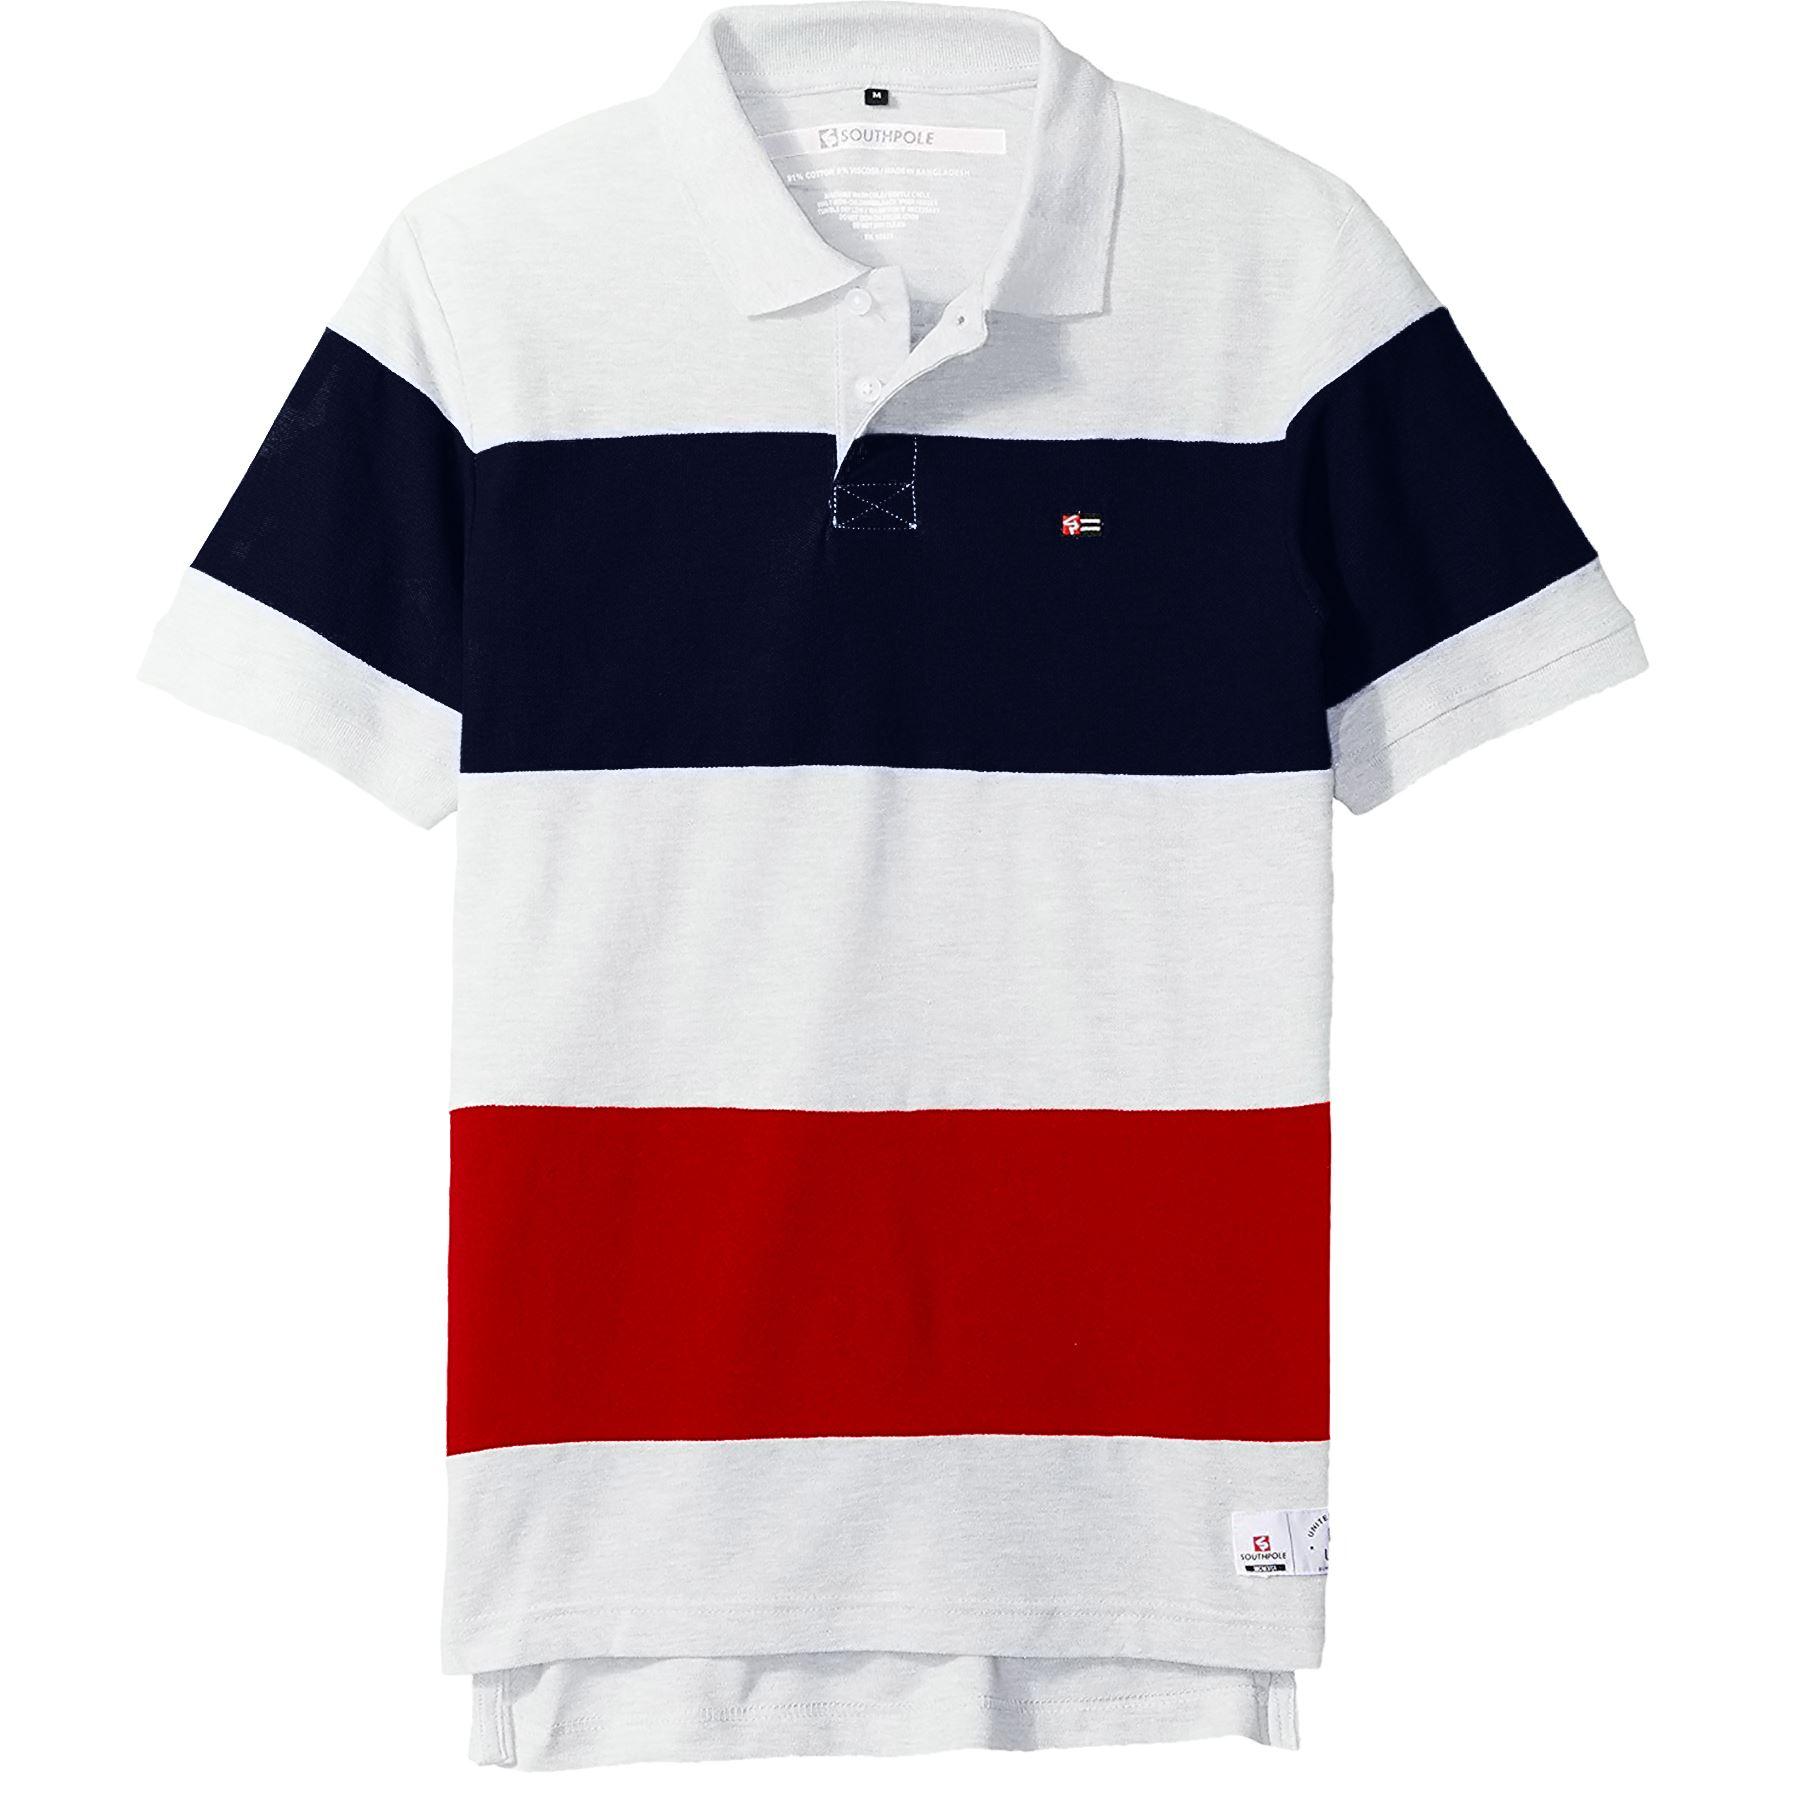 New Mens Pique Polo T Shirt Short Sleeve Cotton Contrast Panel Big Size S-5XL